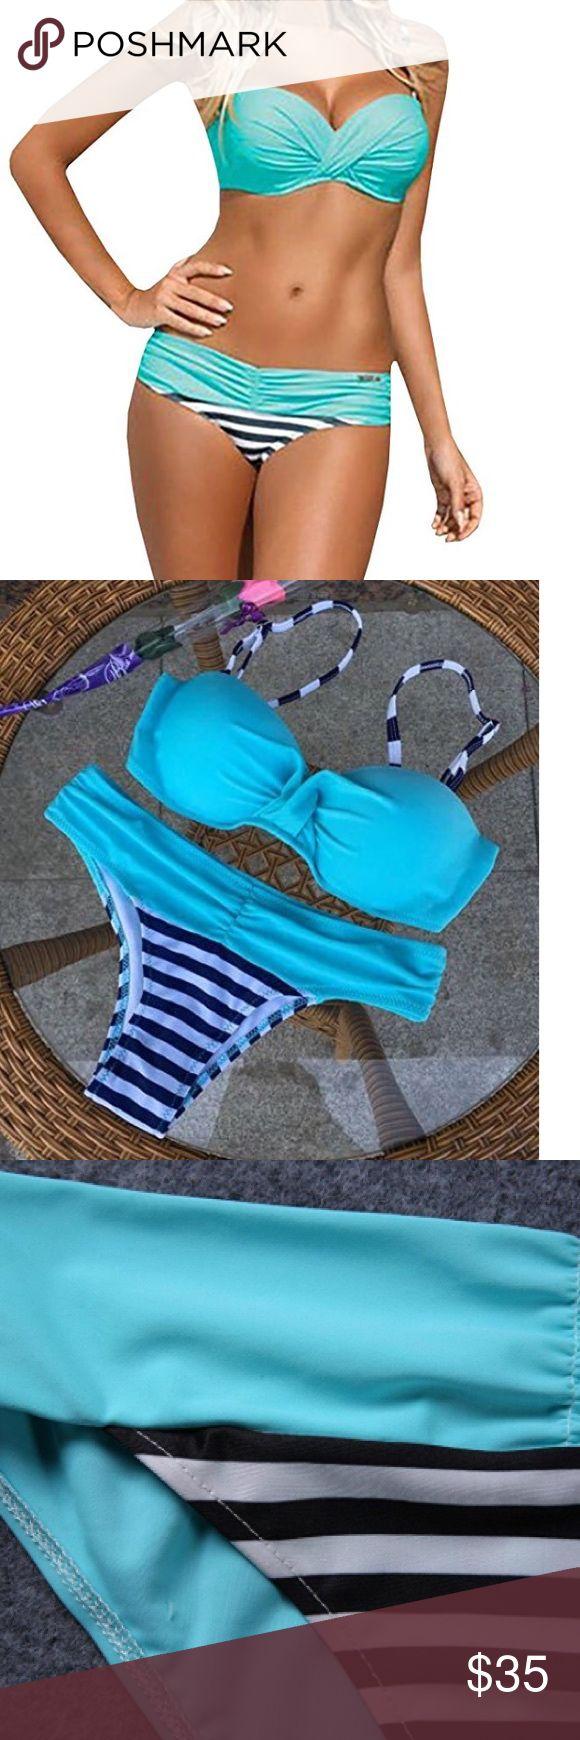 Coming soon 👙 NOTE:Asian Size:S---US:0;M---US:2;L---US:4;XL---US:6,XXL---US:8,3XL---US:10(suggestion),It is samller than US size,Please refer to the size chart(Size Table) Sexy two piece bandage padded push up bikini swimsuit swimwear beach bathing suits for women Bikini Top:Spaghetti strap,push up with rims,criss cross,twist bandeau bikini top Bikinit Bottoms:low waist,patch striped Soft wear,high quality,with stretchy Swim Bikinis